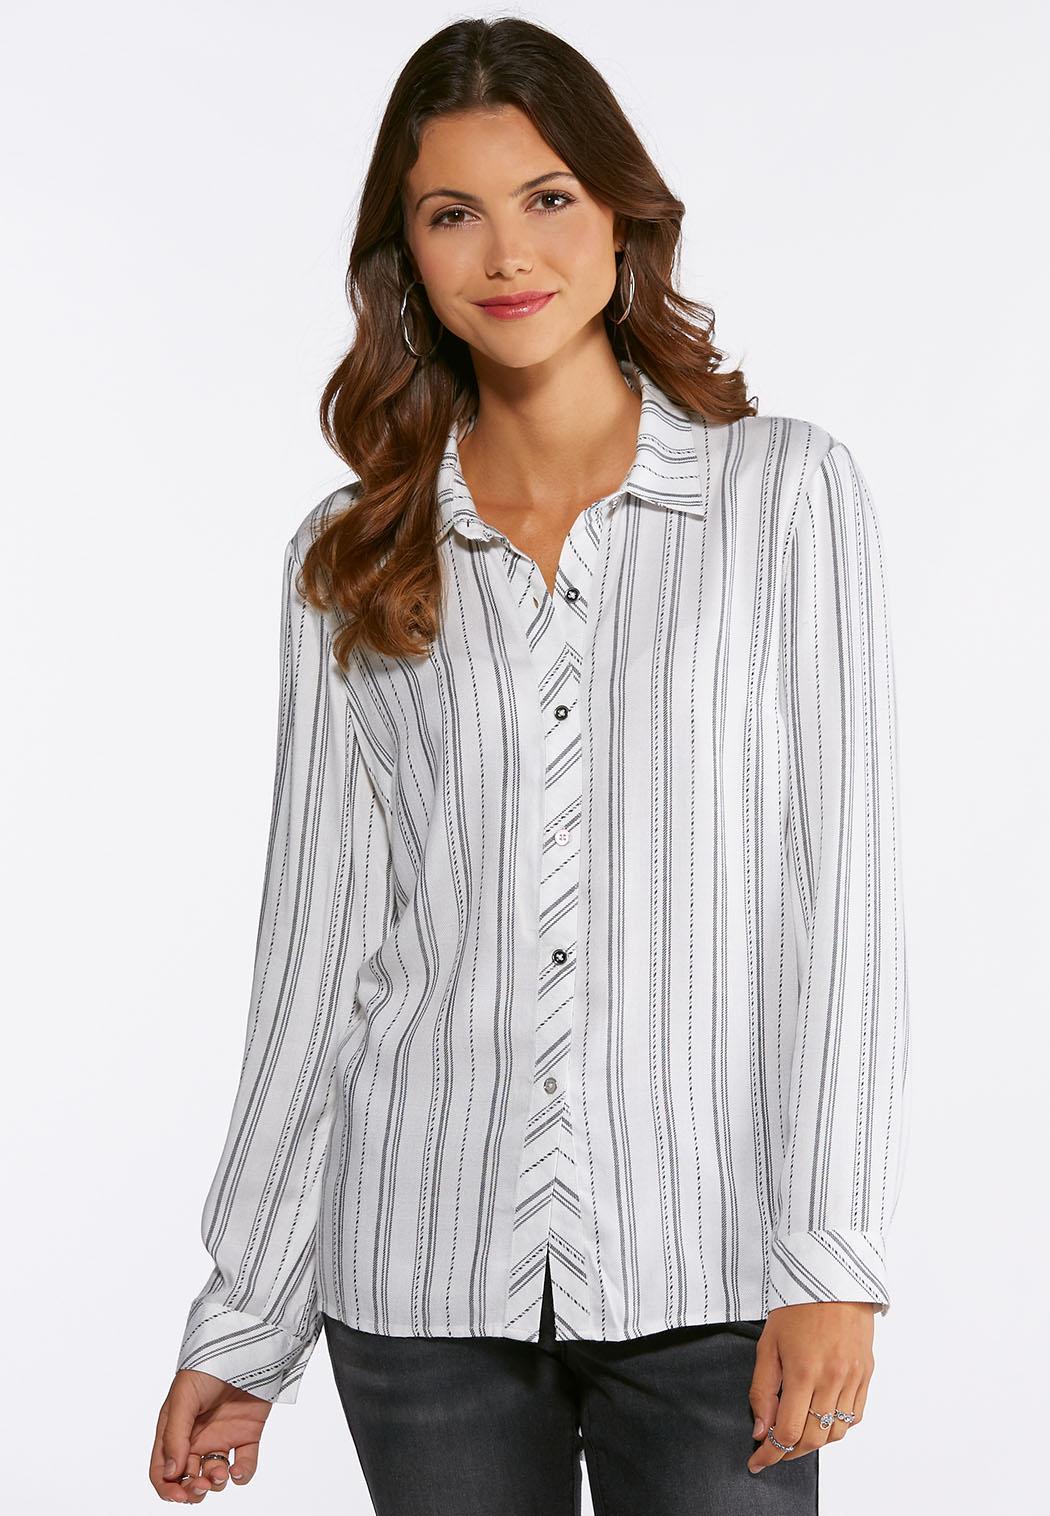 Black And White Striped Boyfriend Shirt Shirts Blouses Cato Fashions